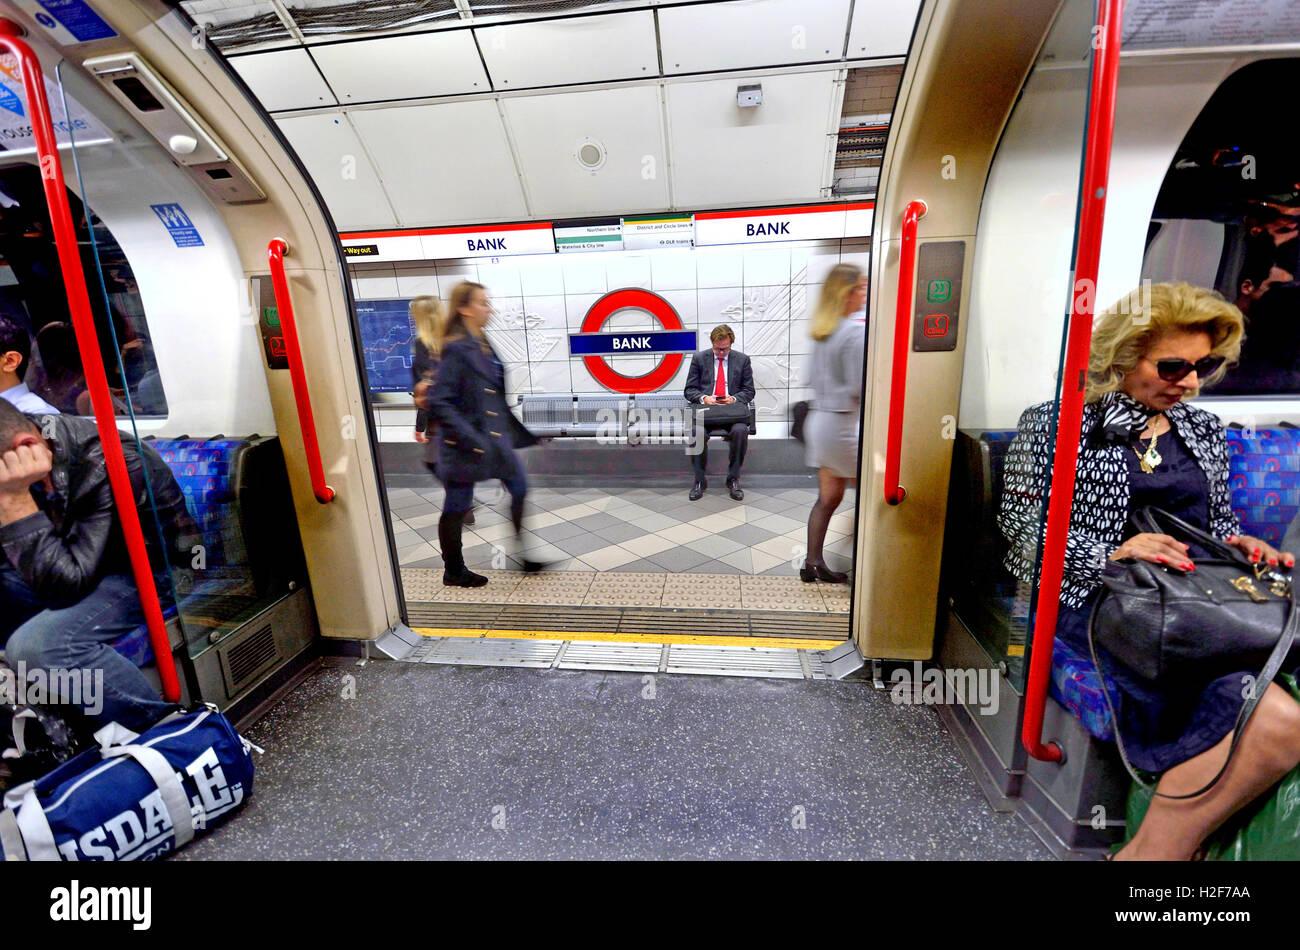 London, England, UK. London Underground tube station: train doors open at Bank station - businessman on the platform - Stock Image